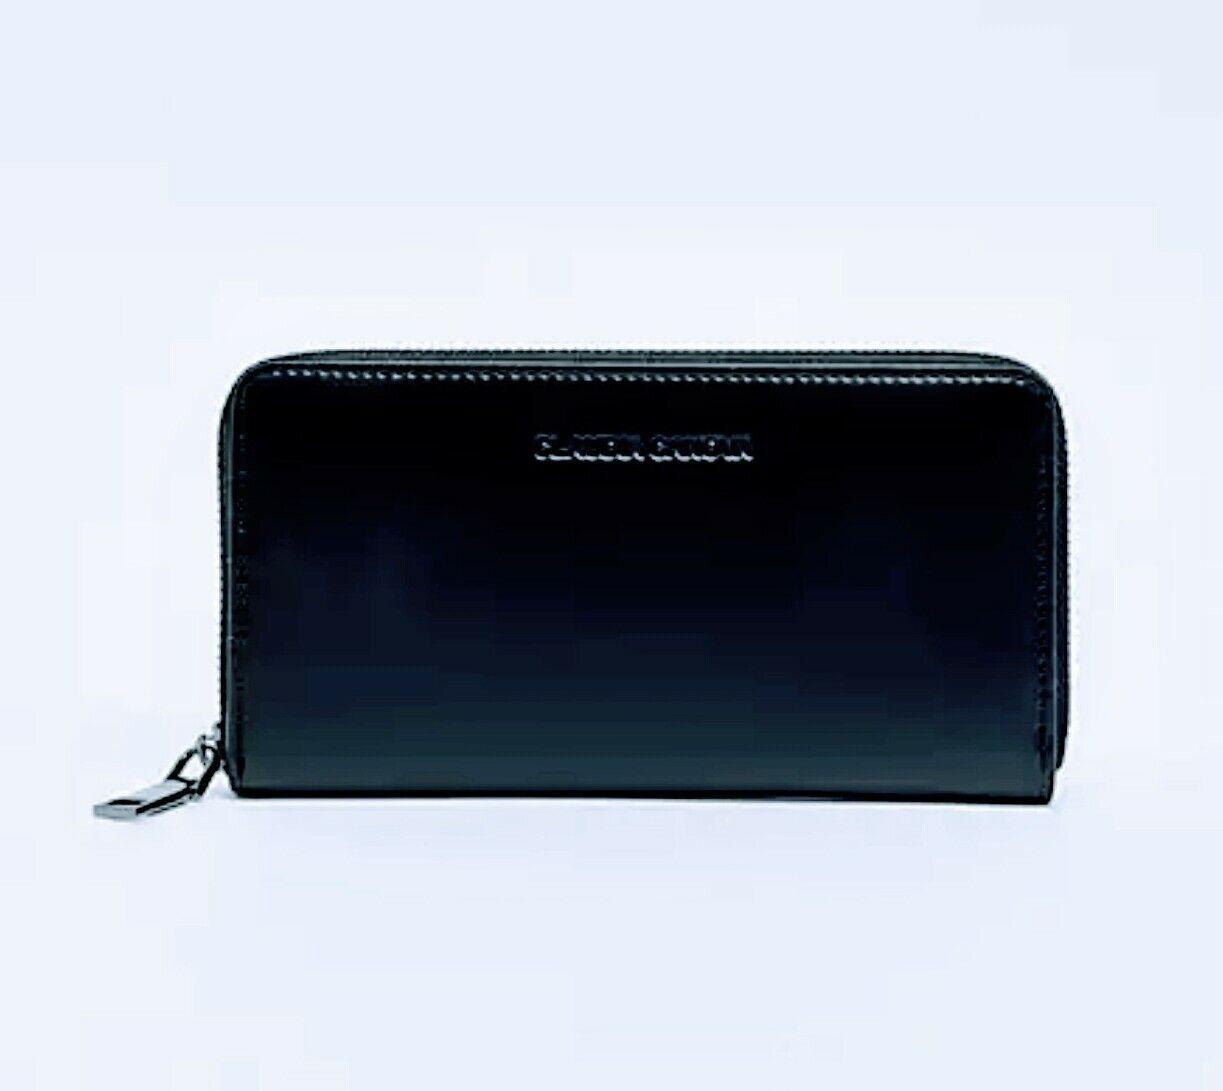 Monedero😊Claudia Canova large zip around wallet in black🥰free shipping ( #2 )